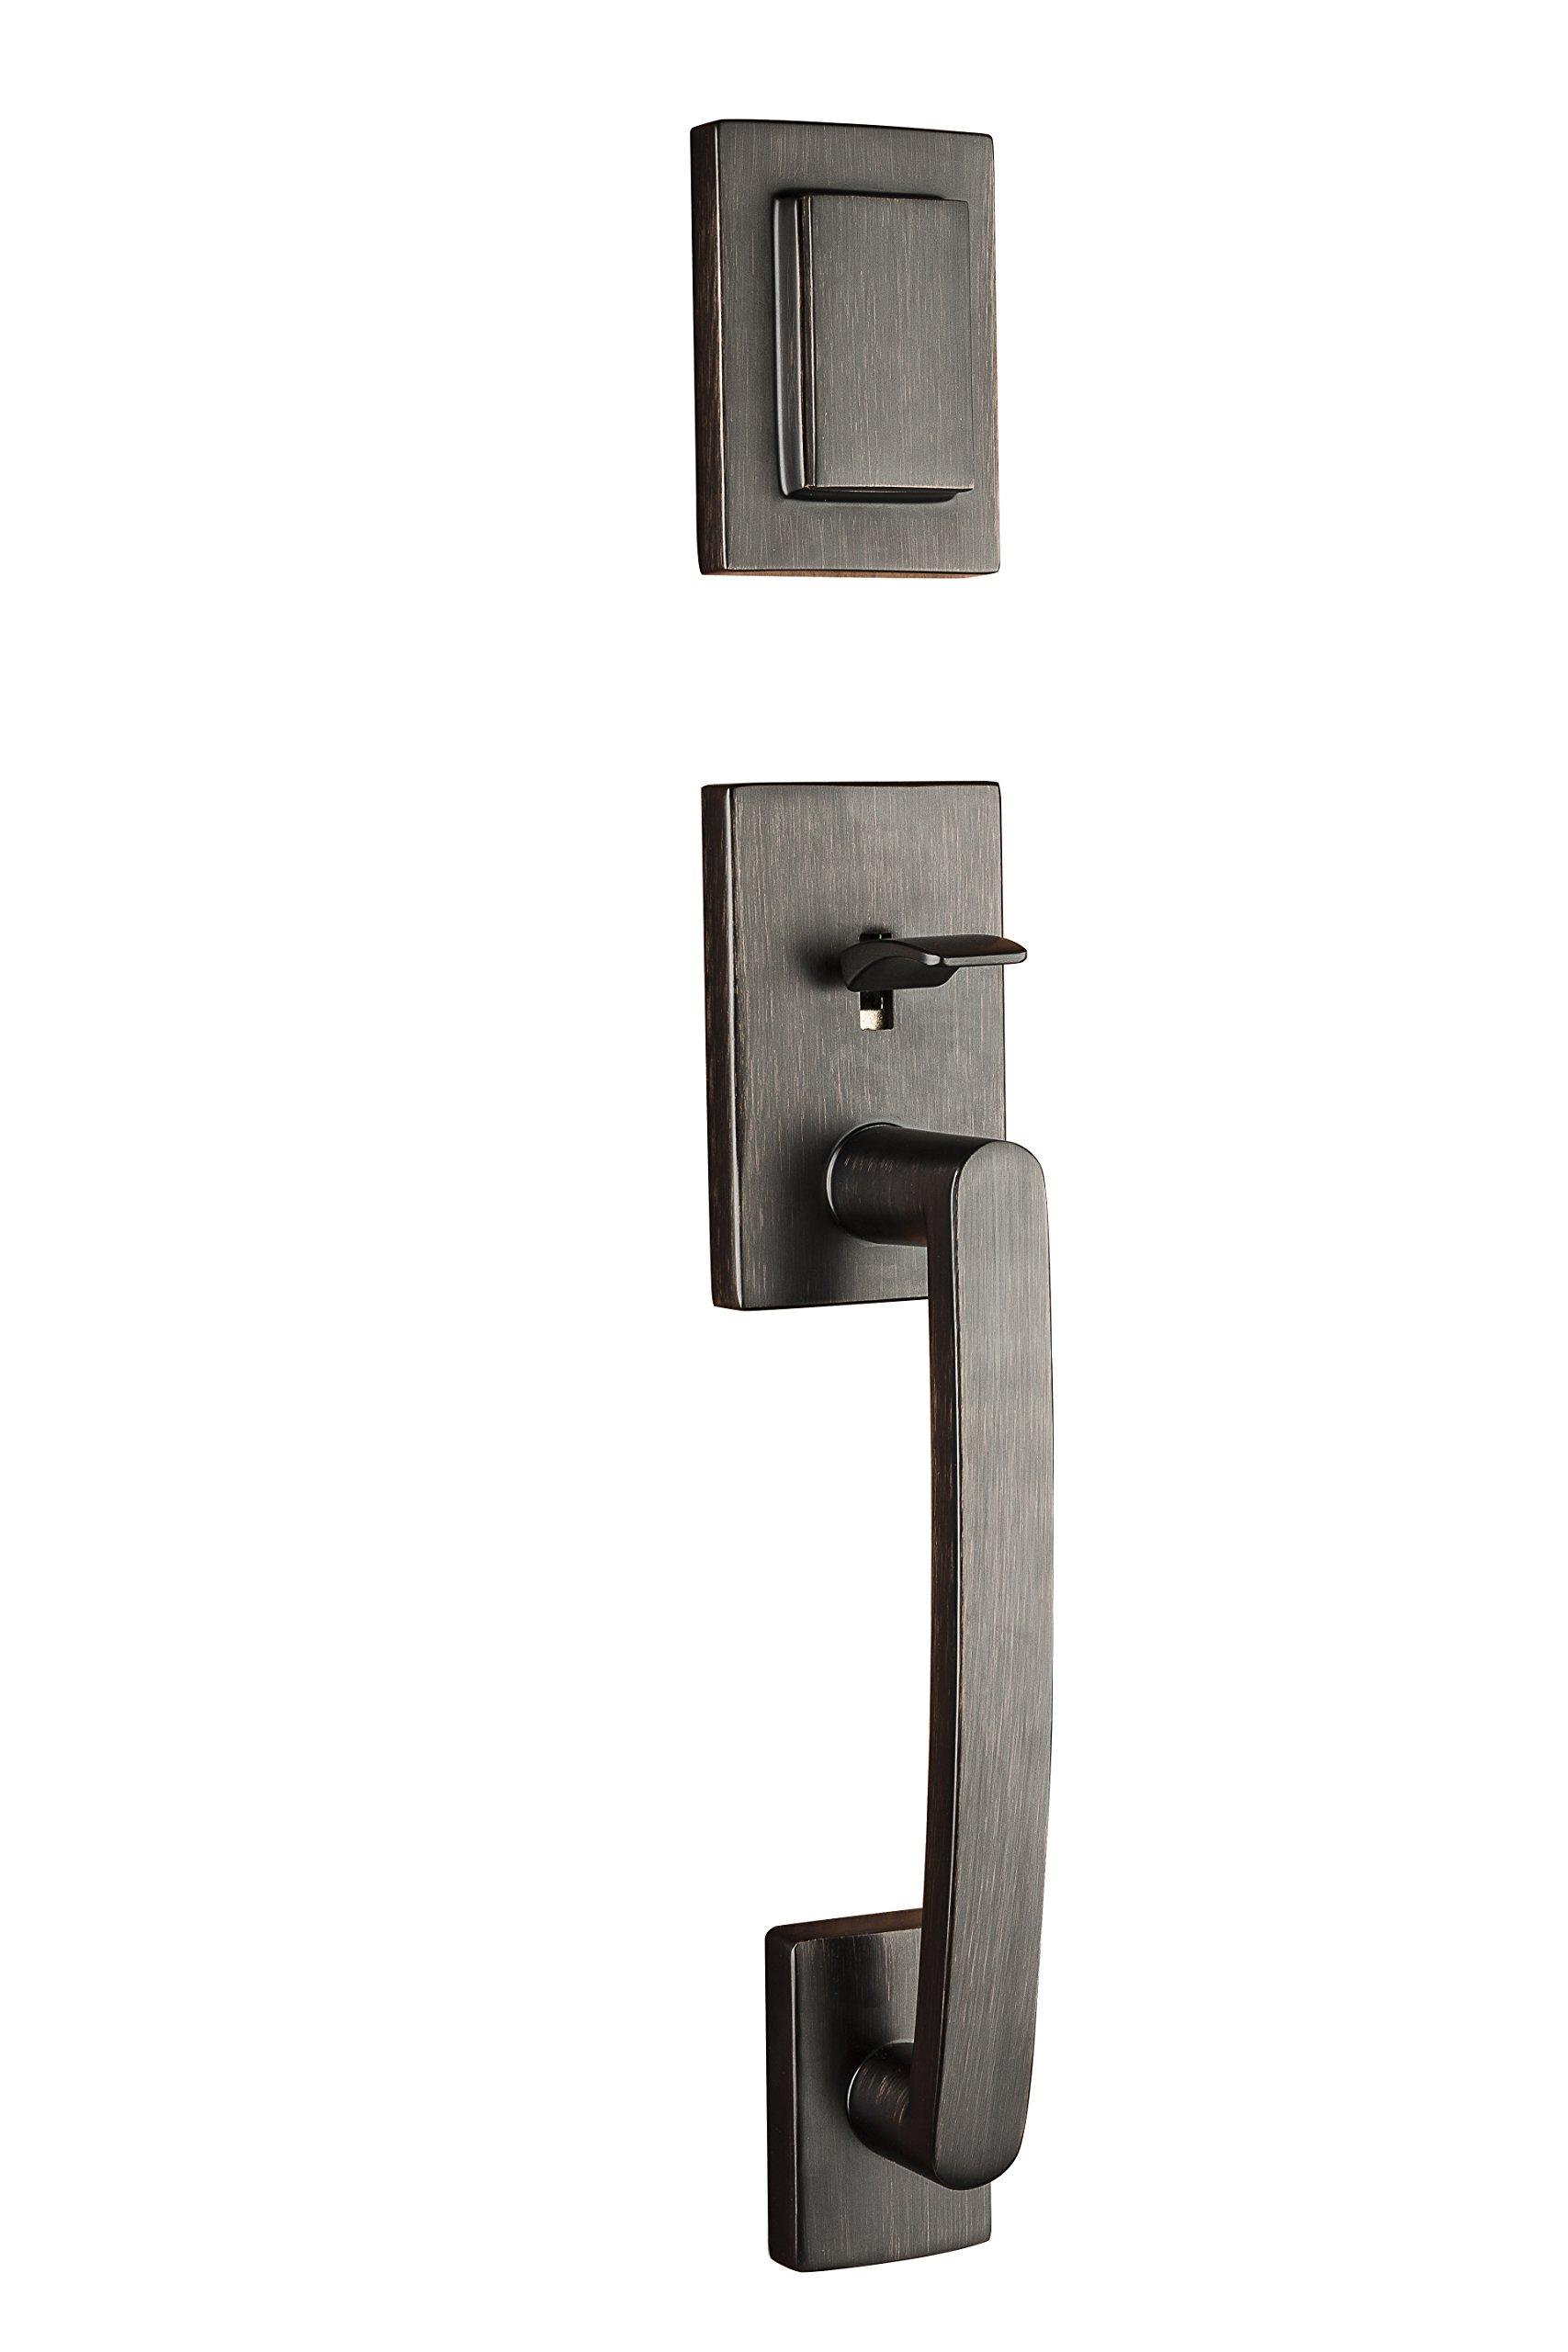 Baldwin Prestige Spyglass Single Cylinder Handleset with Spyglass Lever Featuring Smartkey in Venetian Bronze